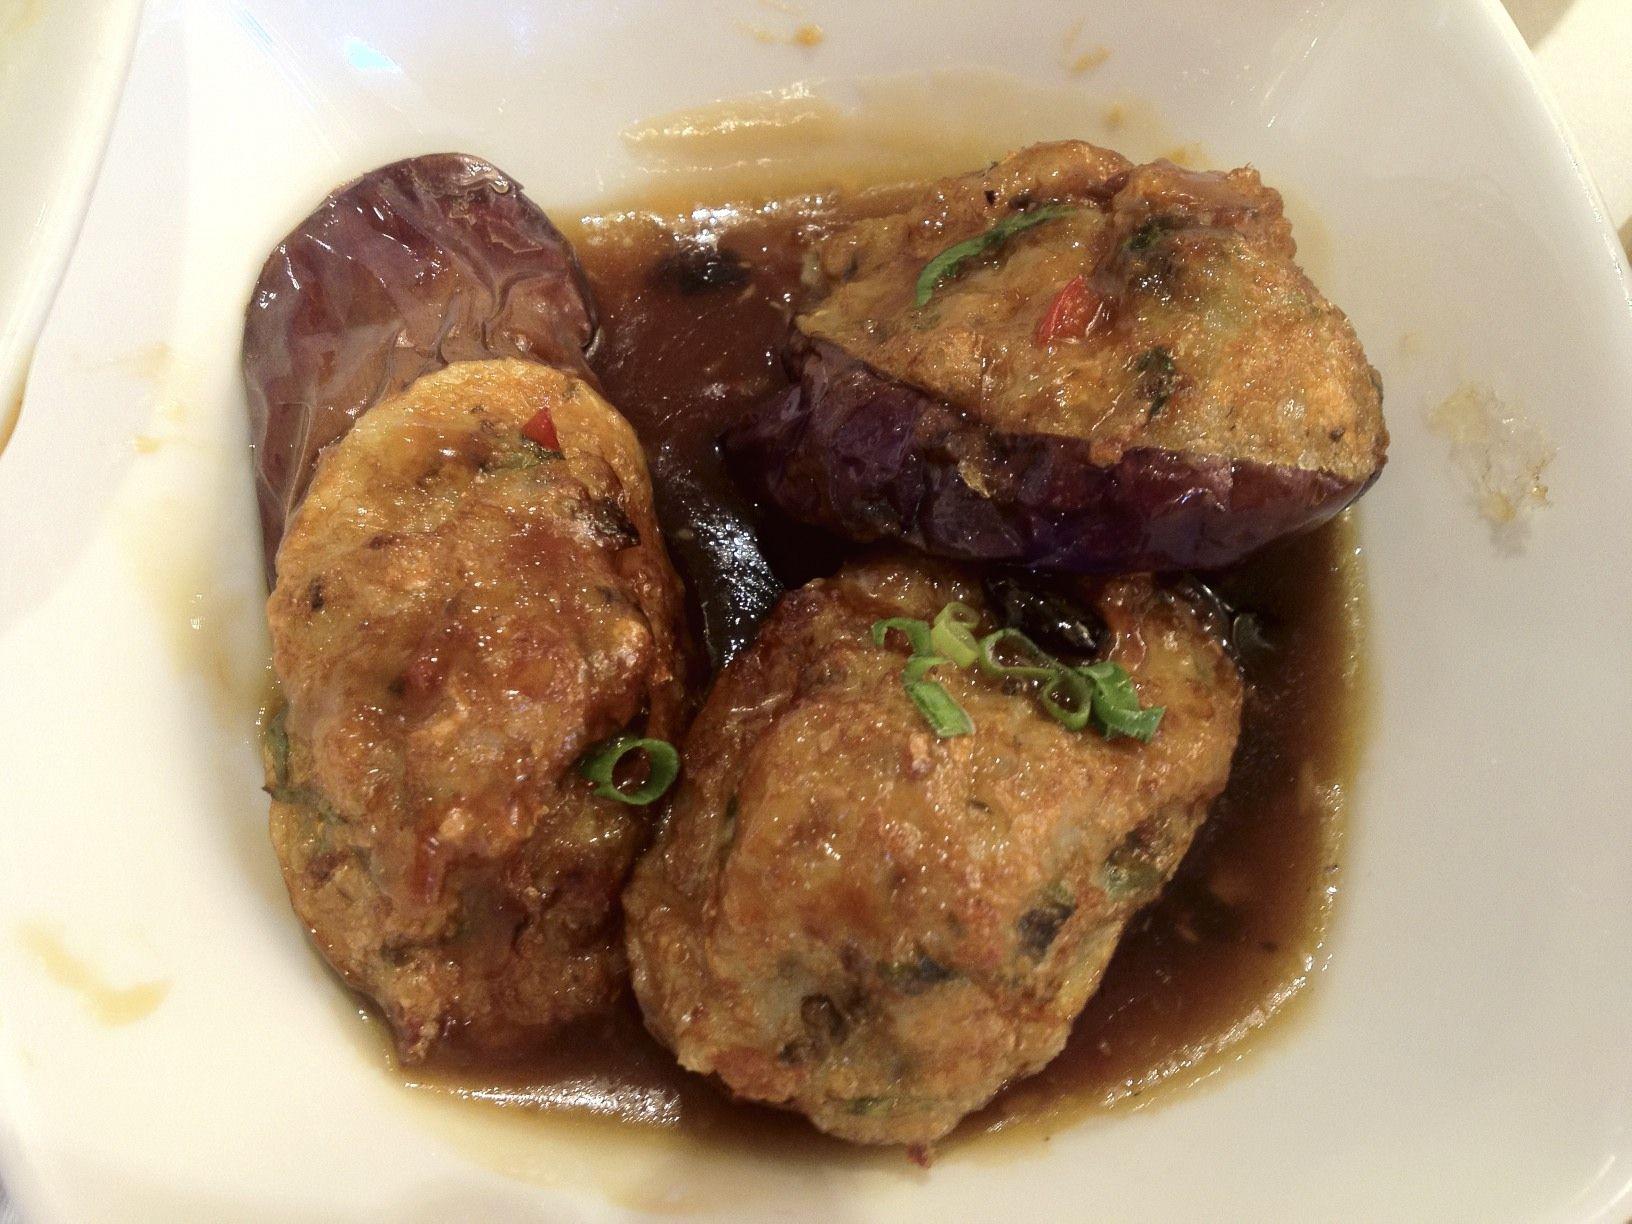 Hong Kong Keuken : A typical hong kong dish eggplants stuffed with minced fish